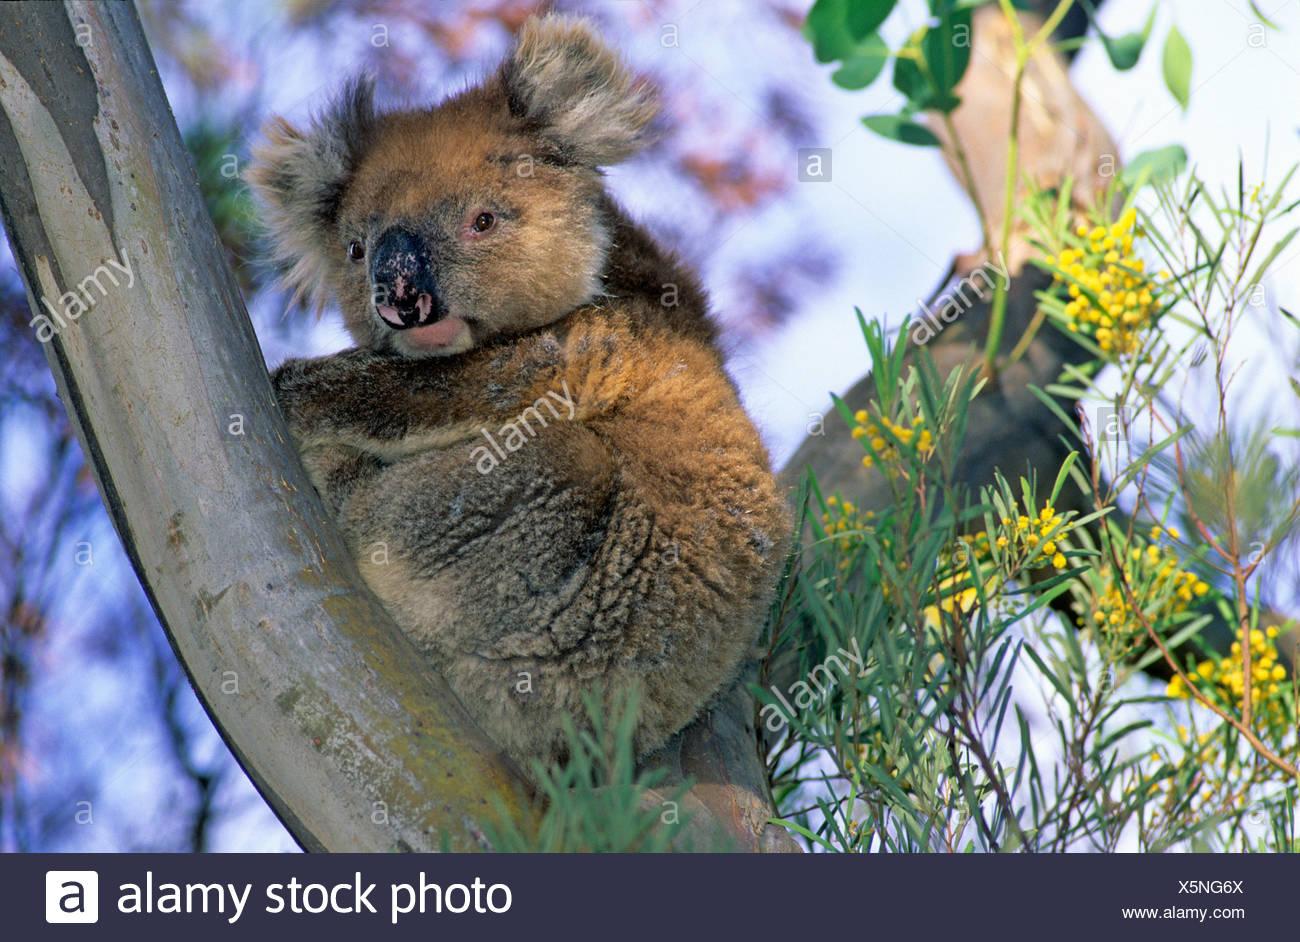 Koala in an Eucalyptus tree, Kangaroo Island, South Australia, Australia - Stock Image